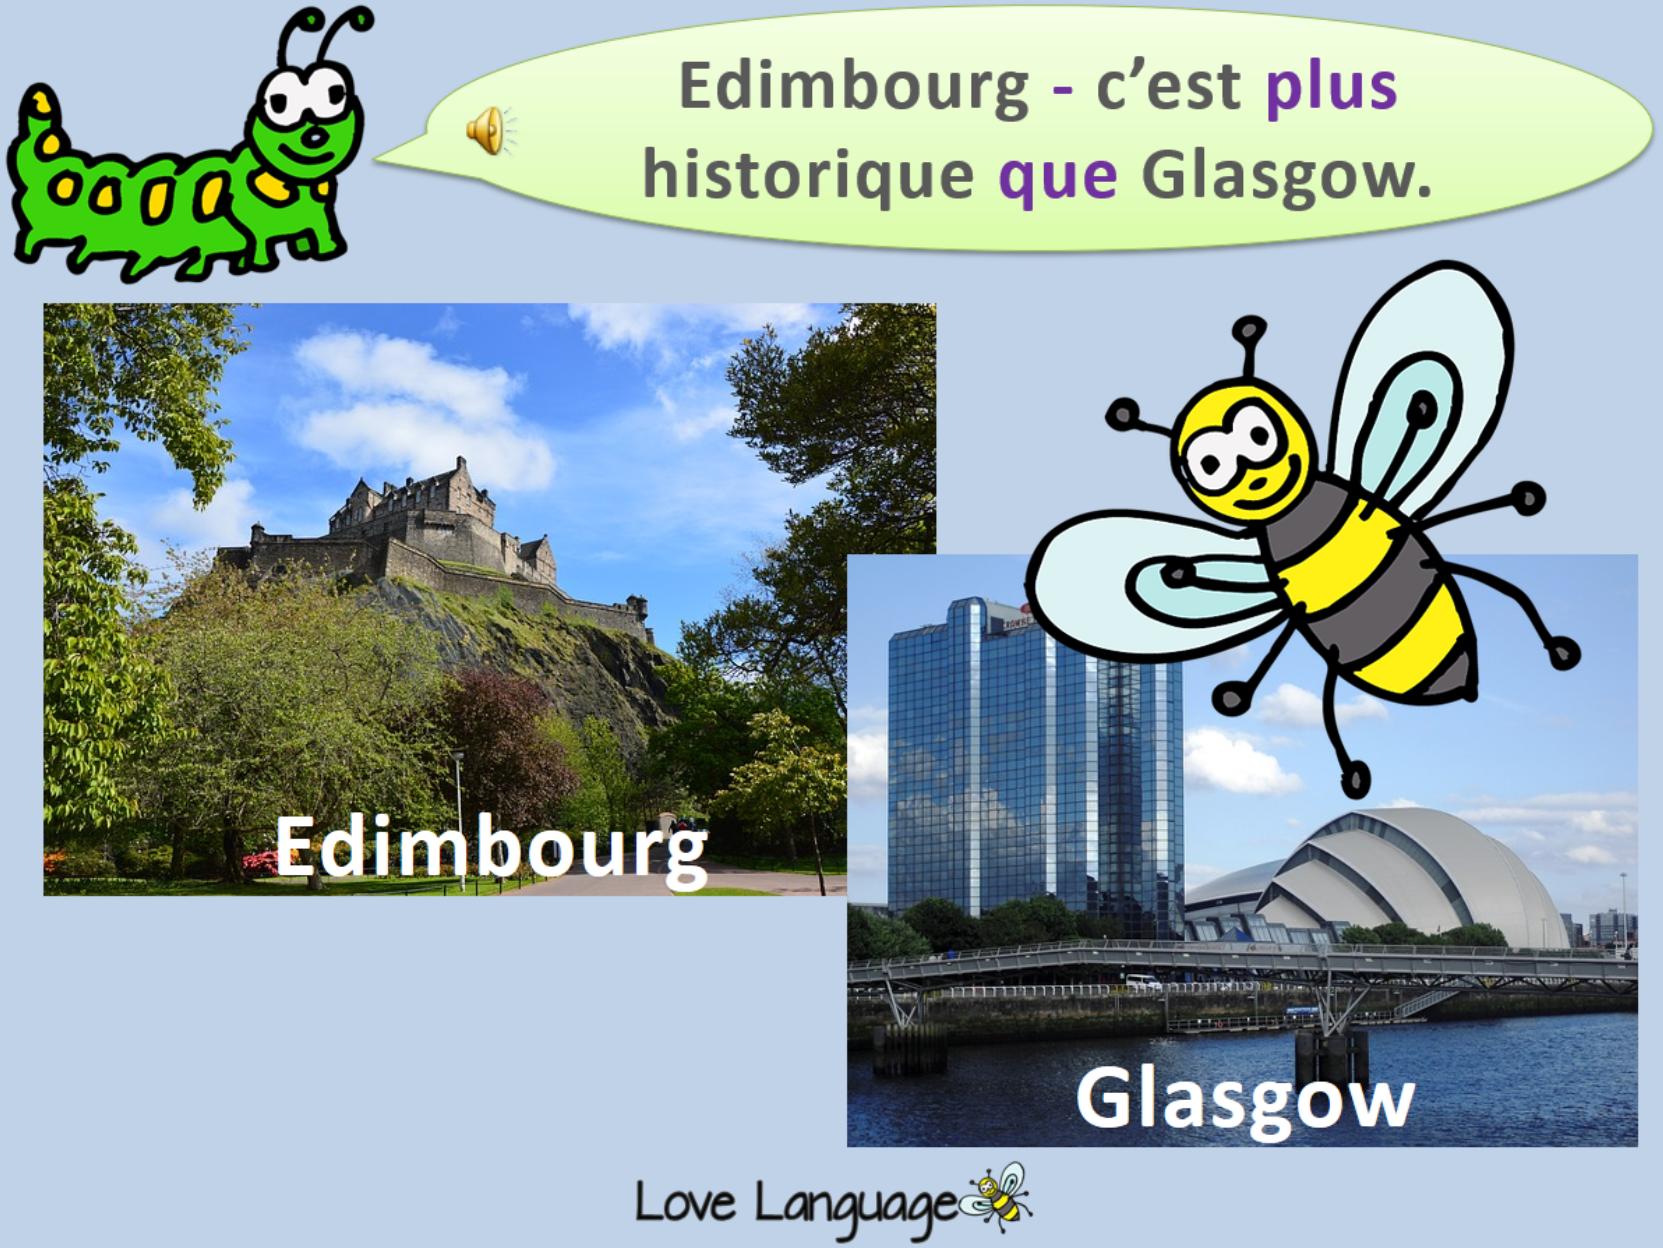 French Local Community - Local area descriptions bundle